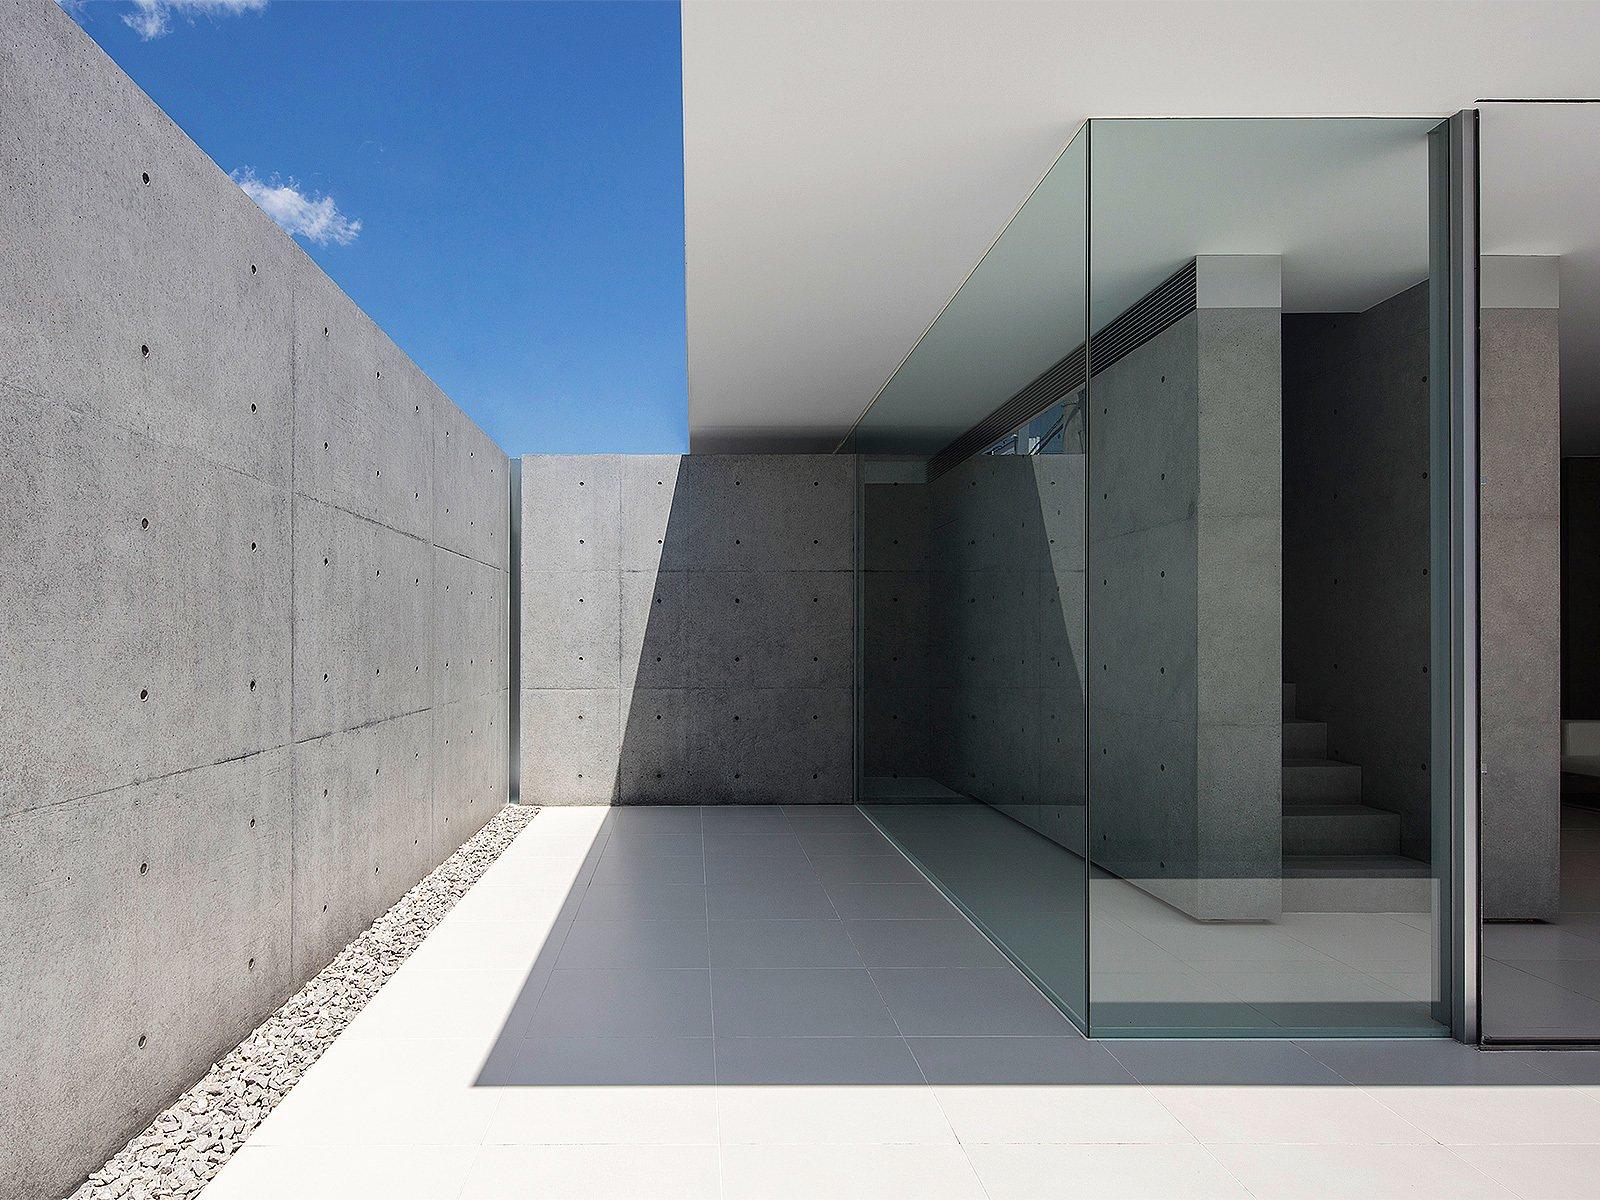 FU-House by Leibal